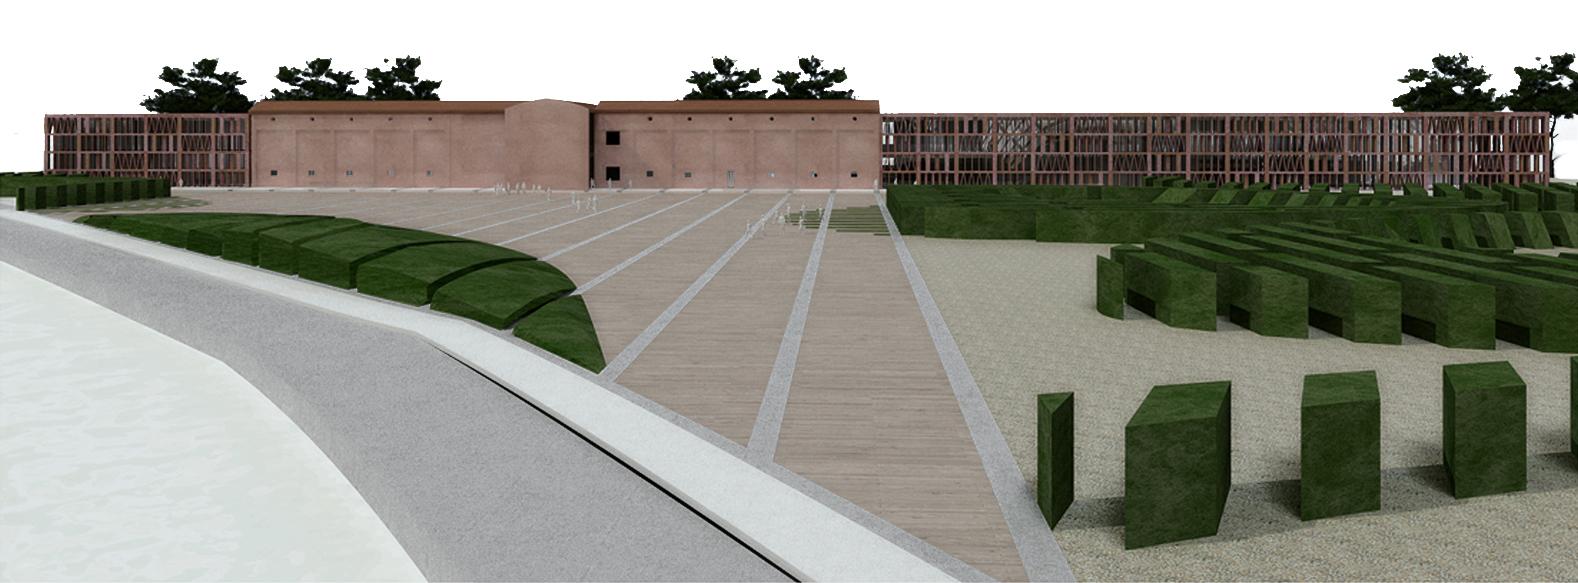 3_tabaccaia_render_esterno